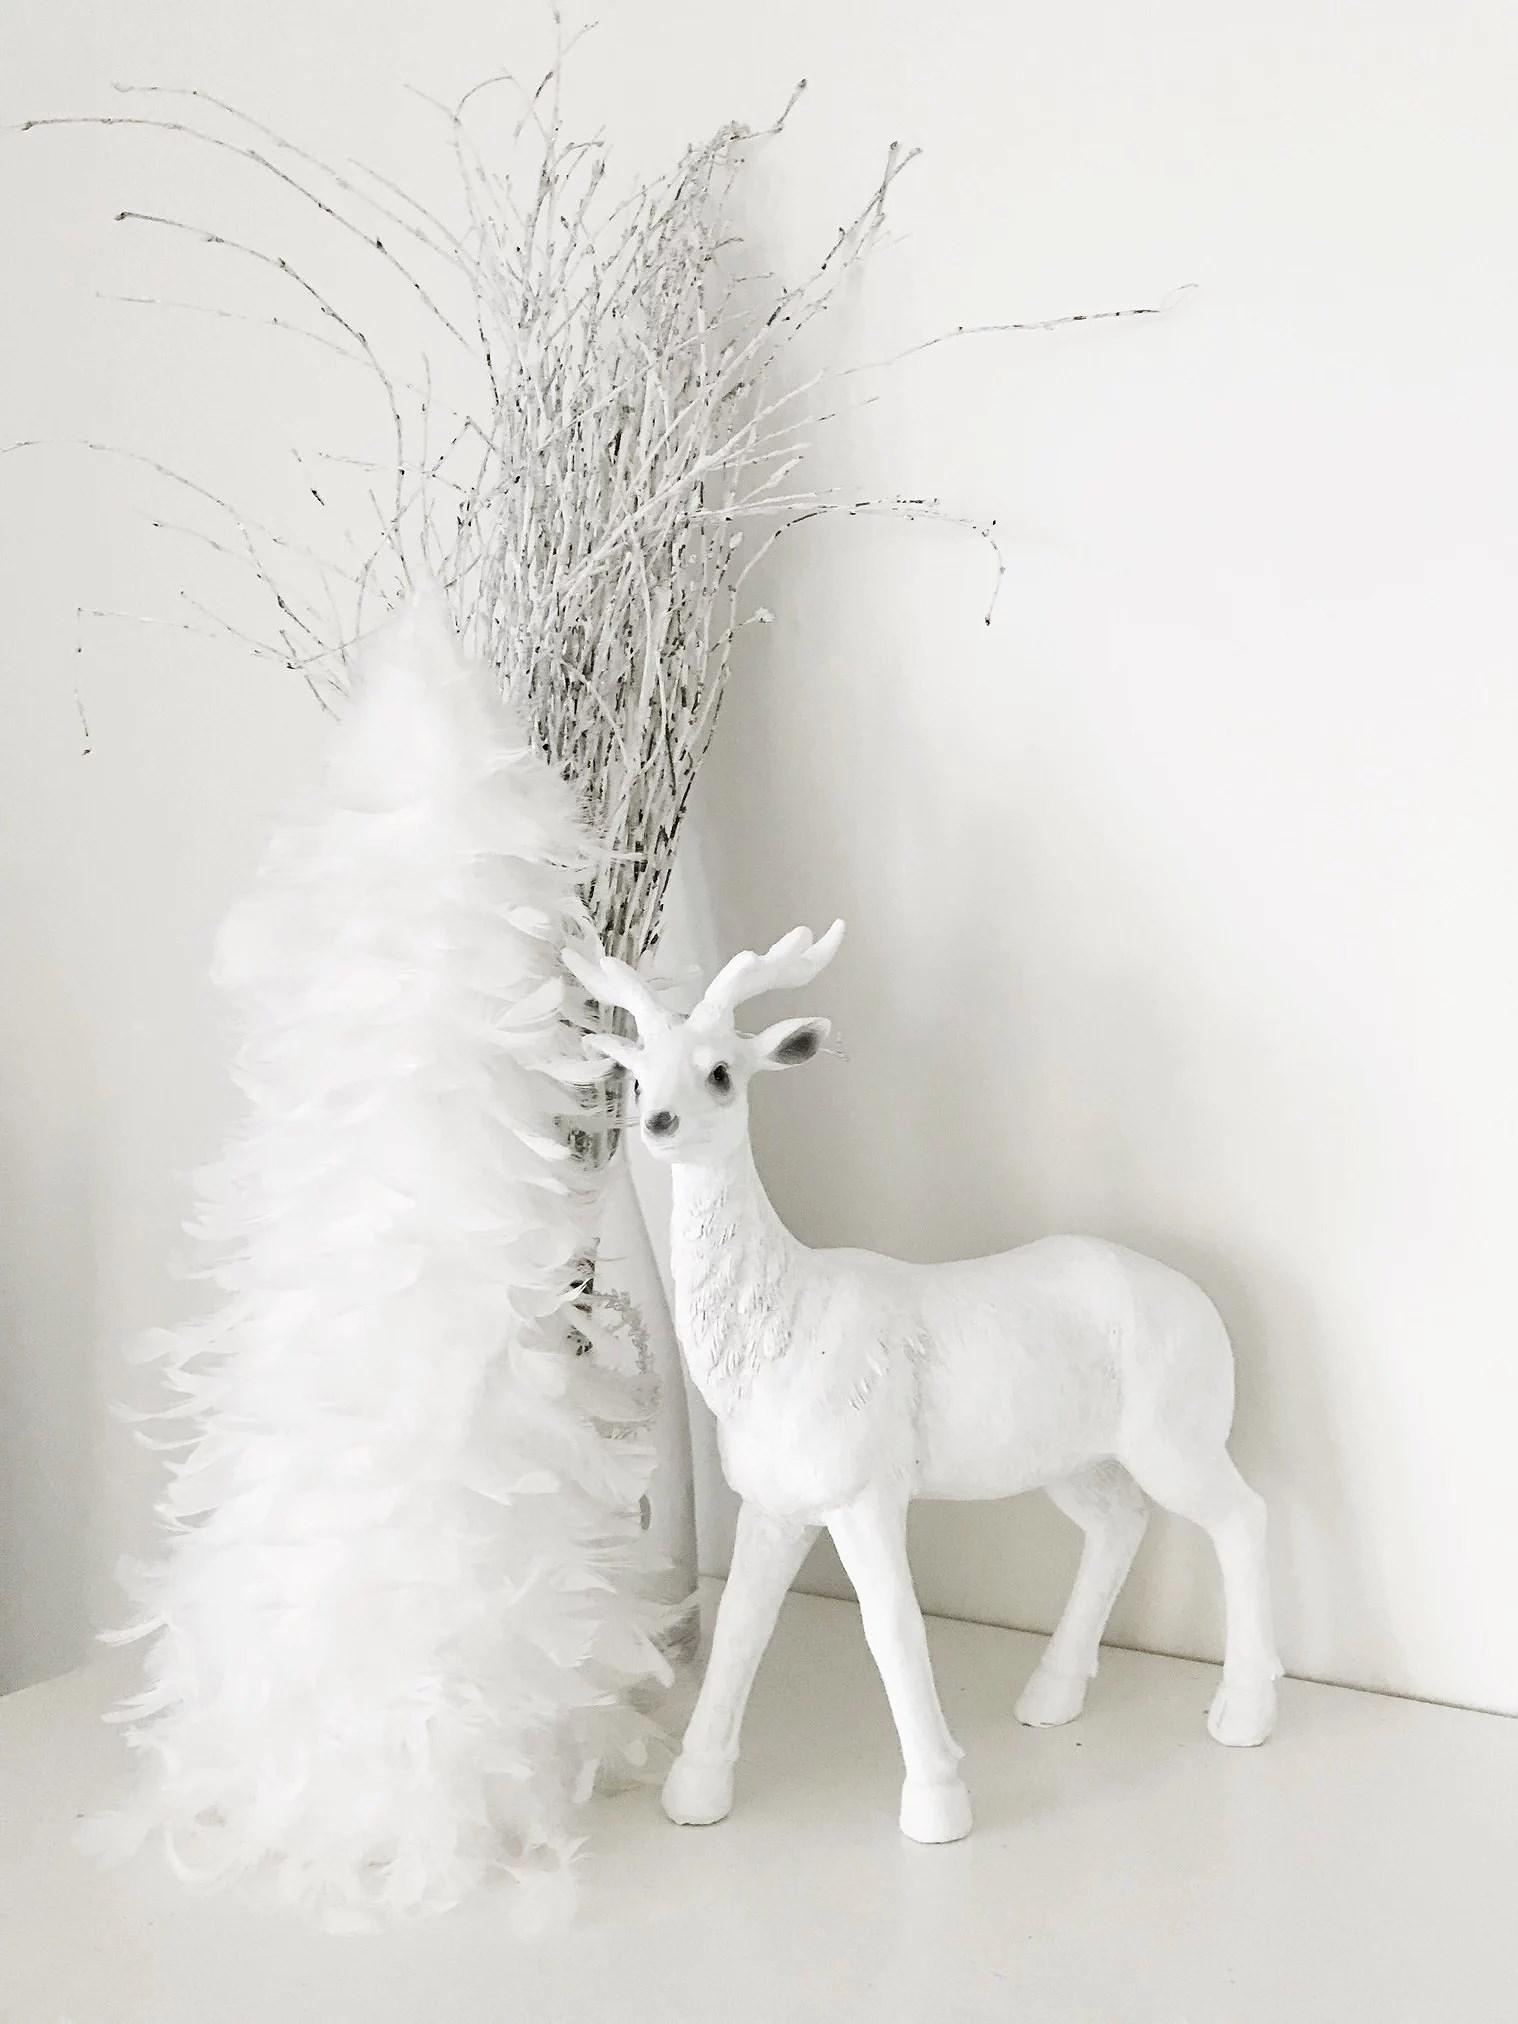 Julen har kommit